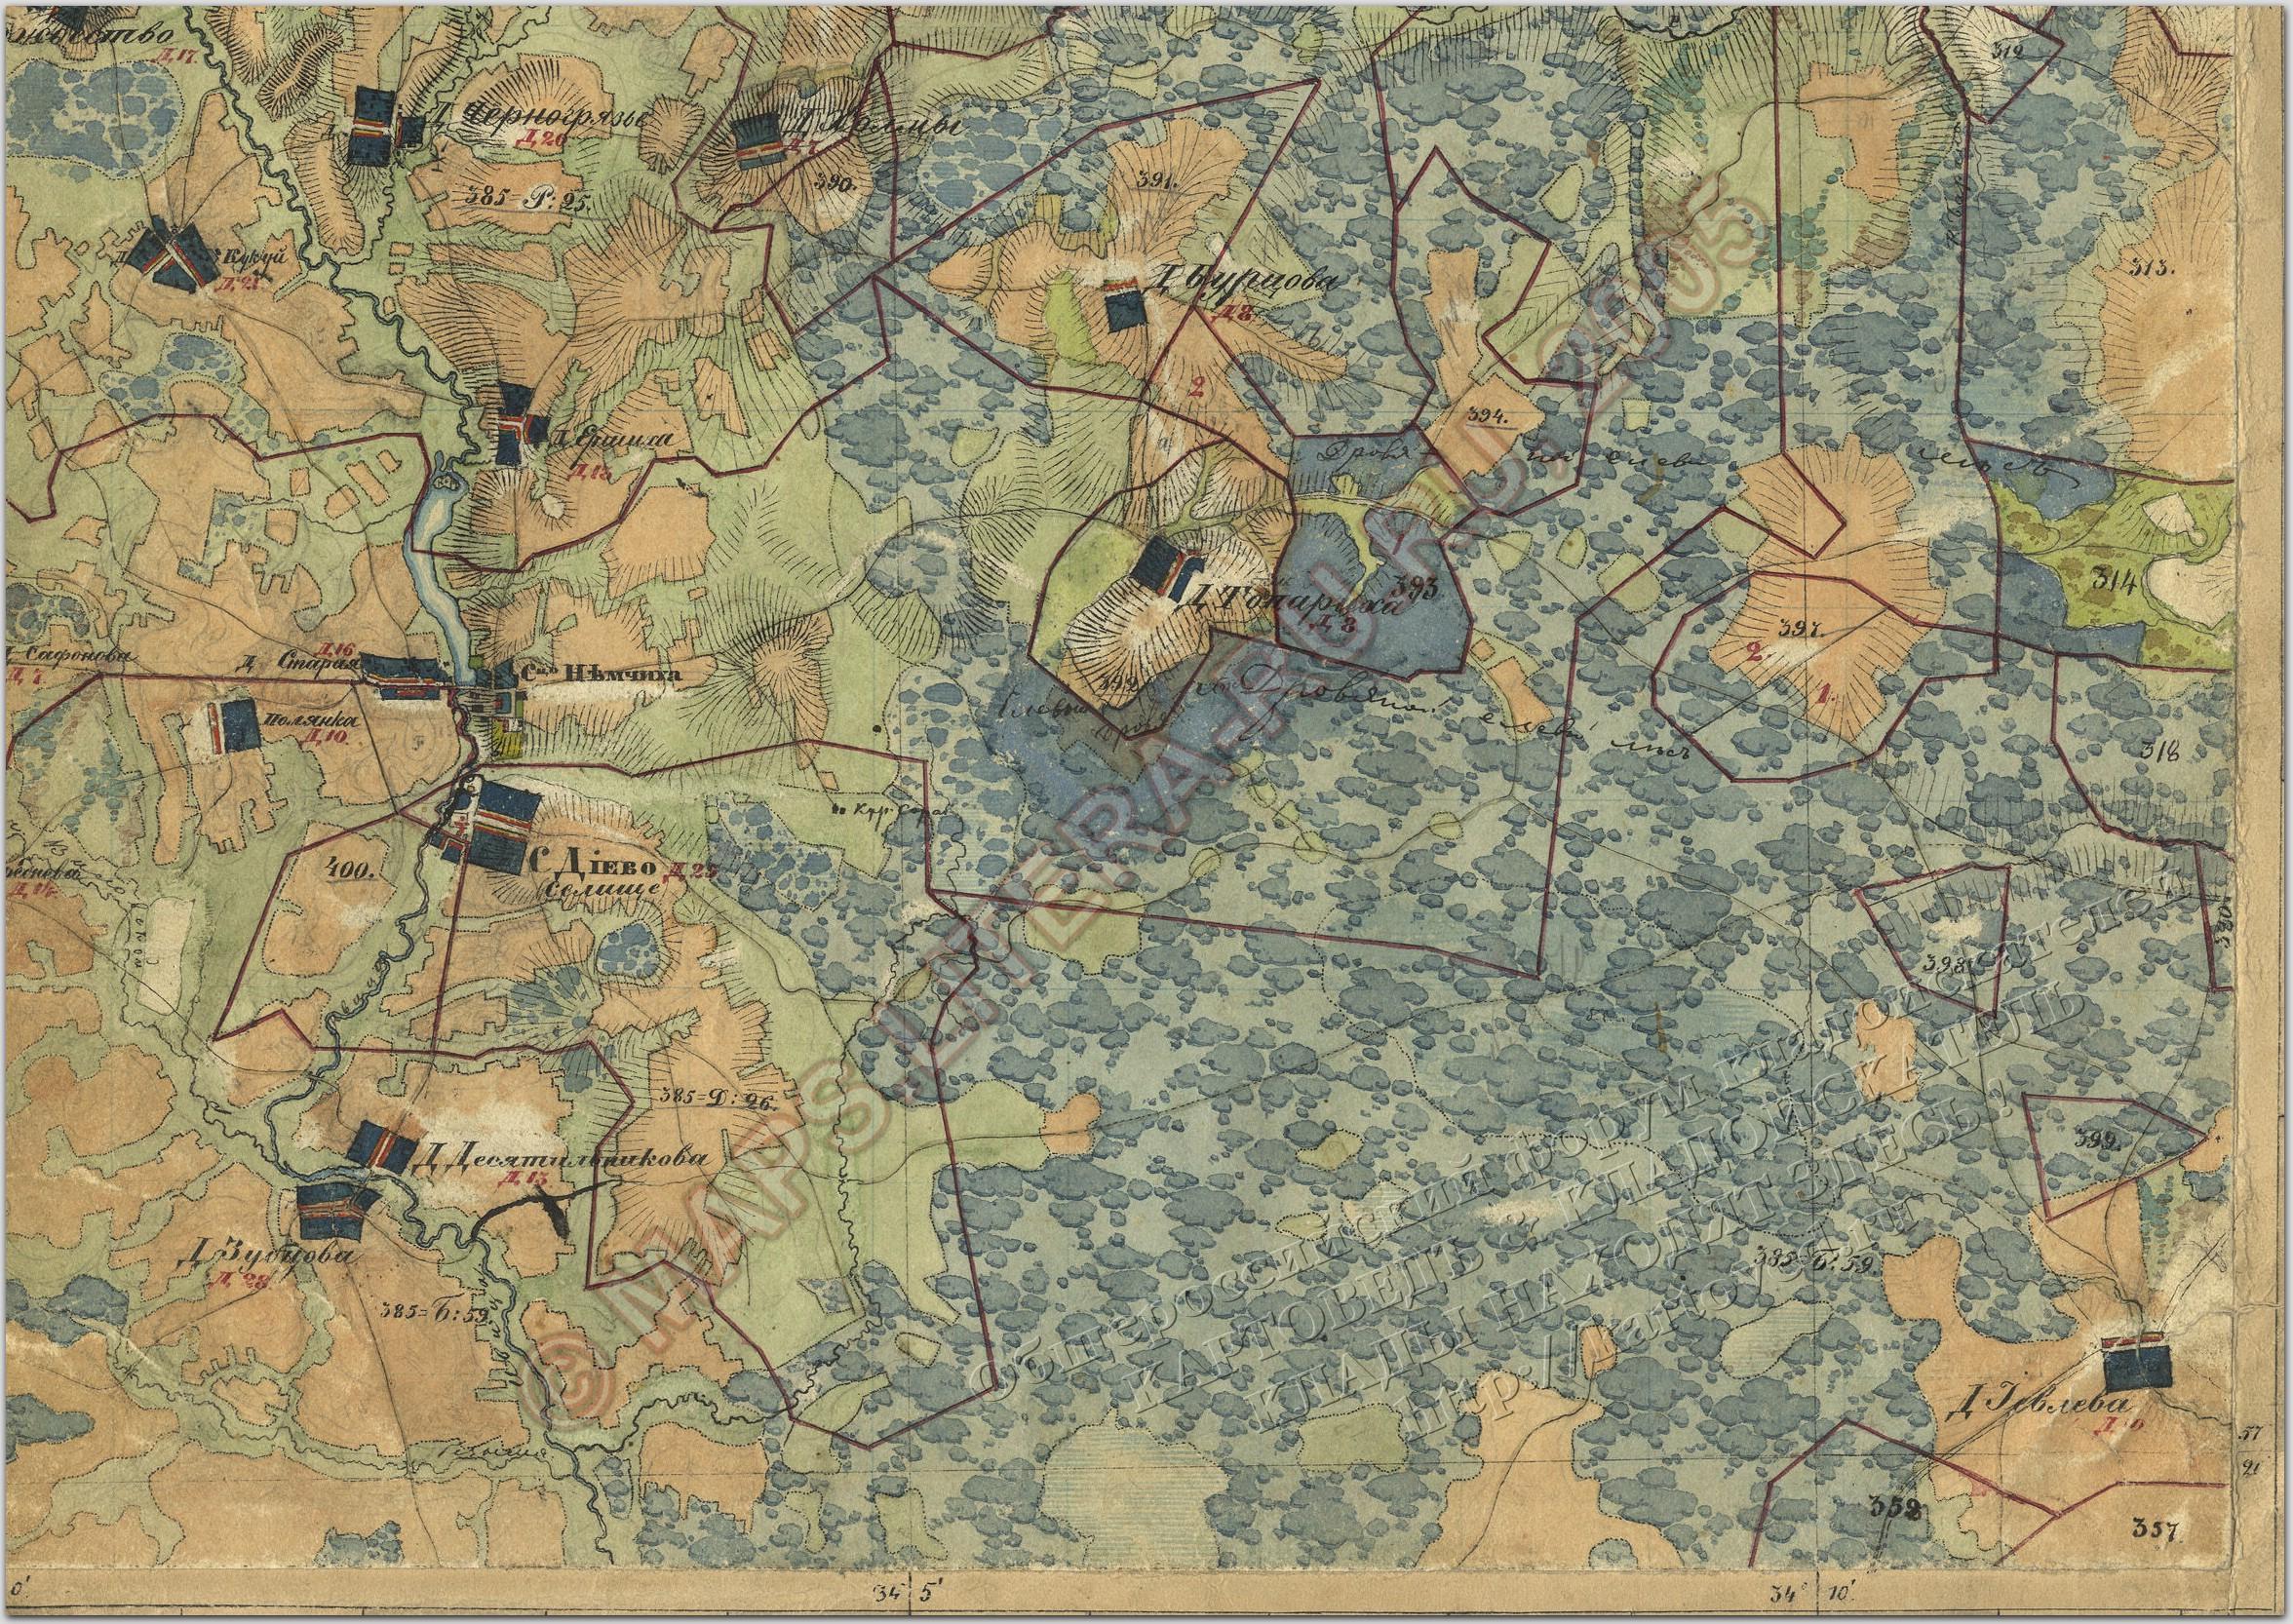 инвестору карта тверской области менде Микрокредиты Санкт-Петербурге